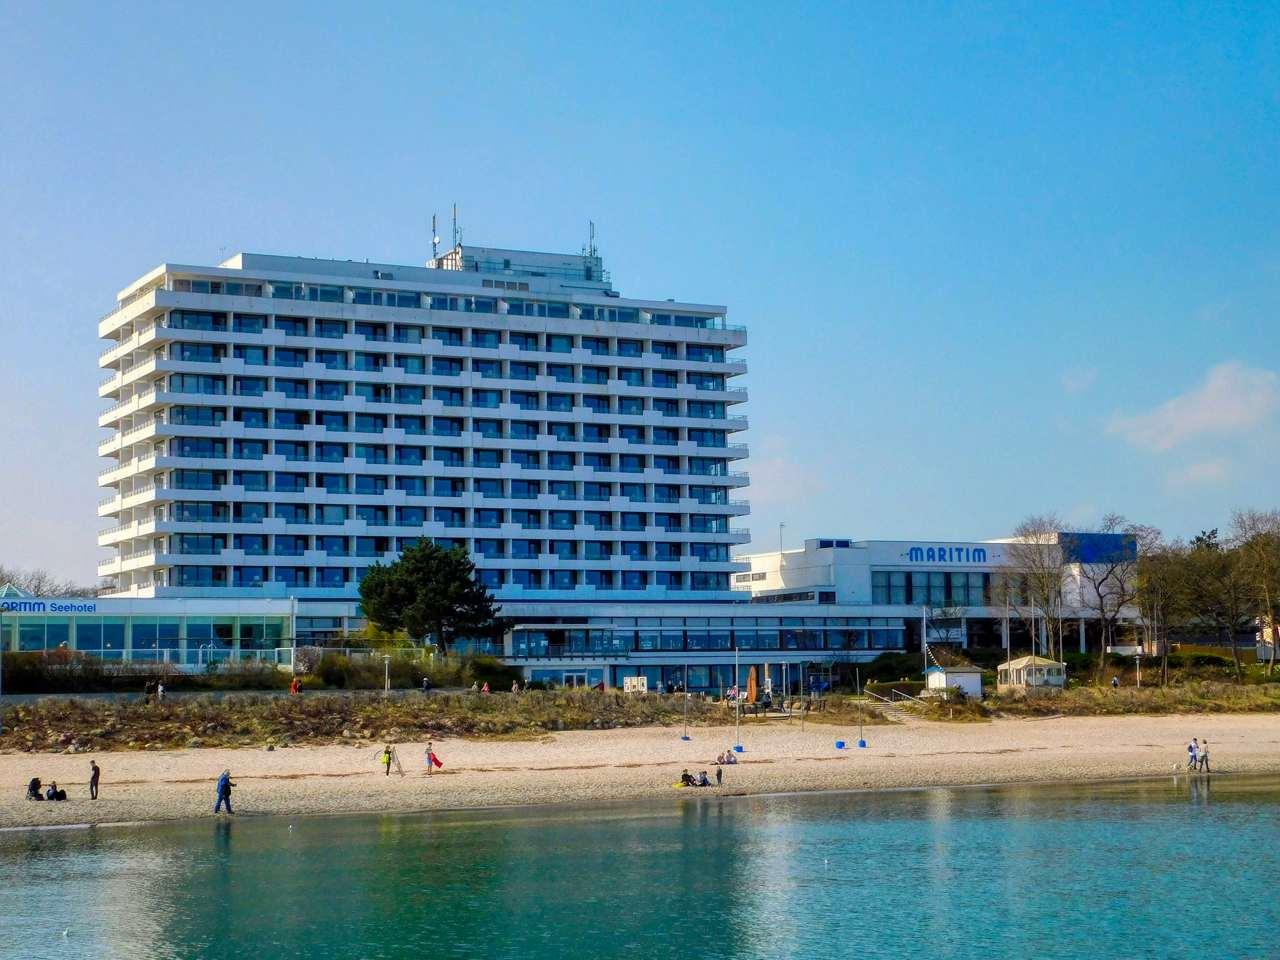 Martim Seehotel Timmendorfer Strand